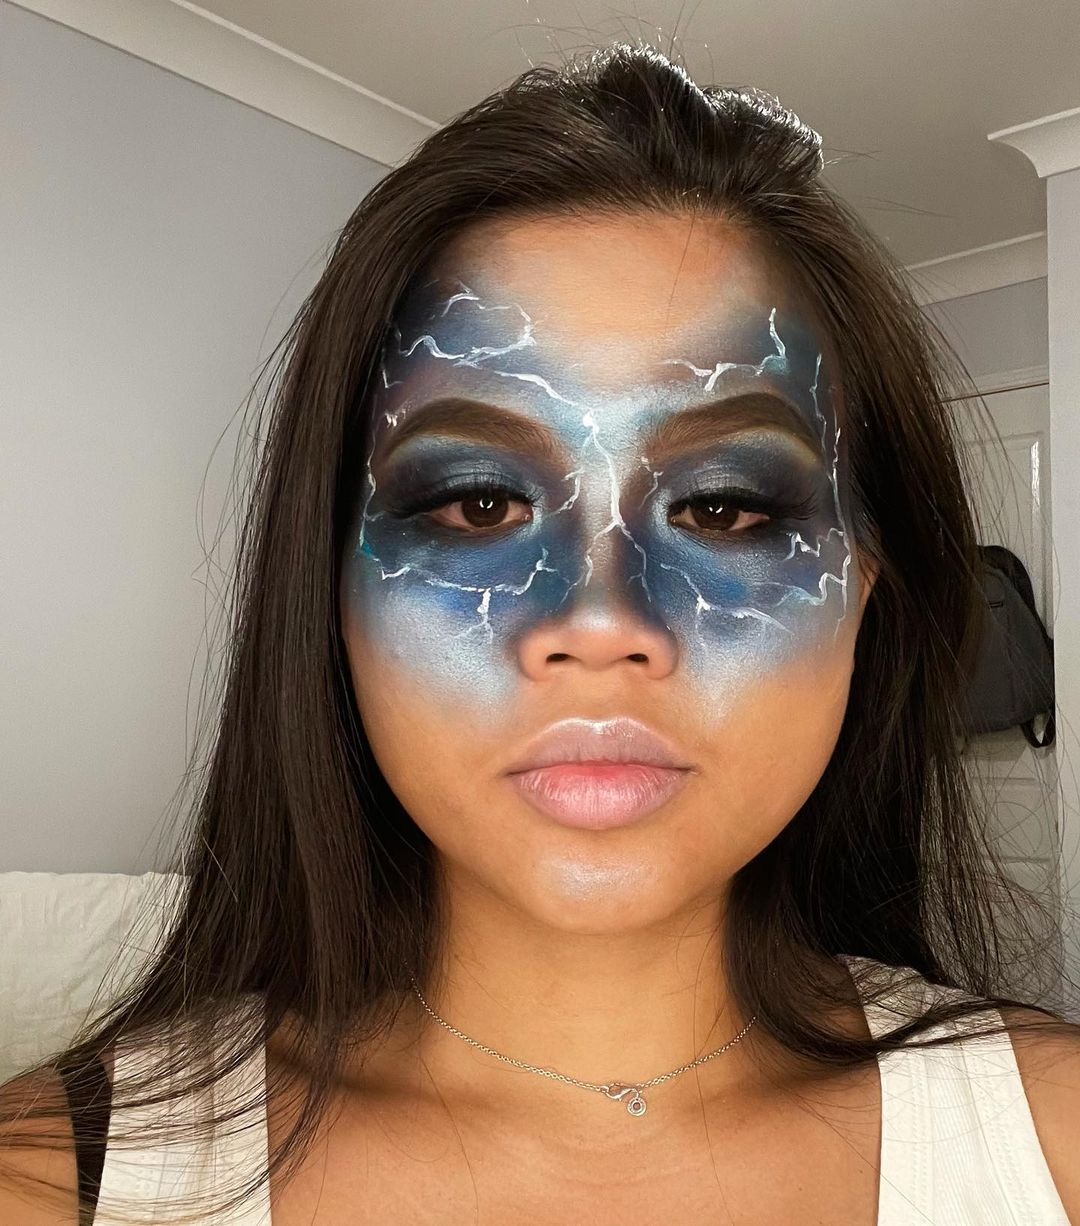 Halloween eye makeup stormy eyes